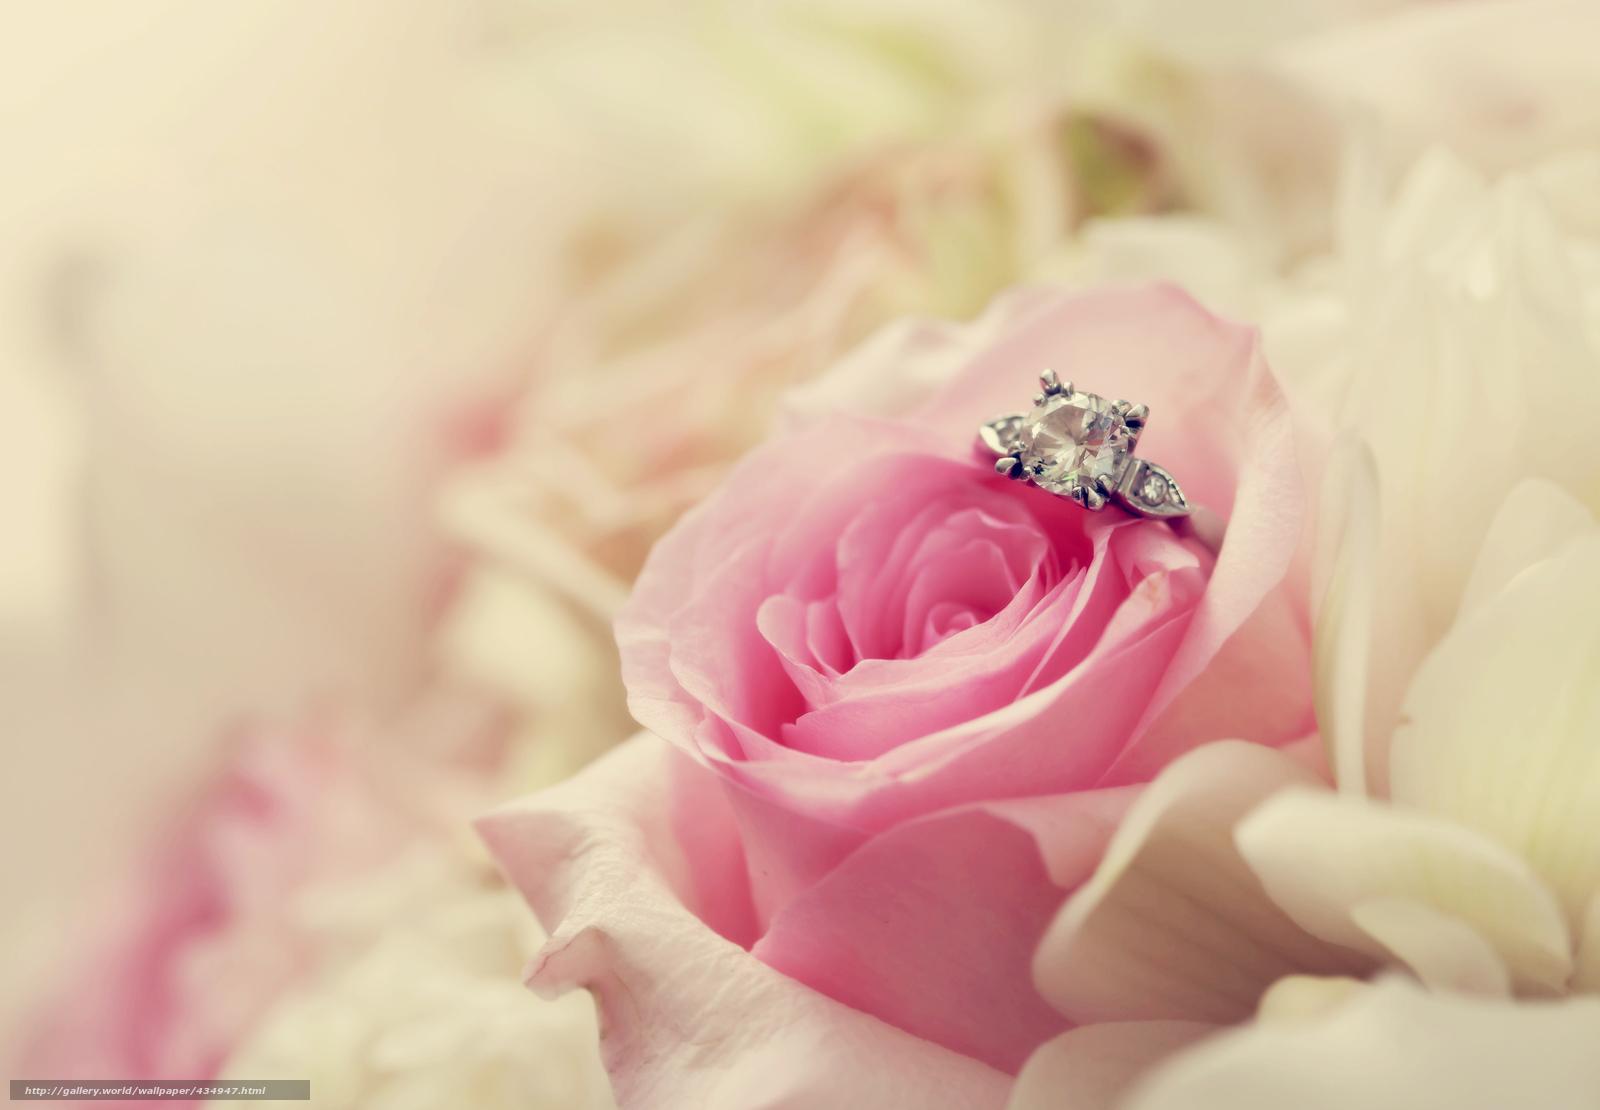 tlcharger fond d'ecran fleur, rose, anneau, macro fonds d'ecran